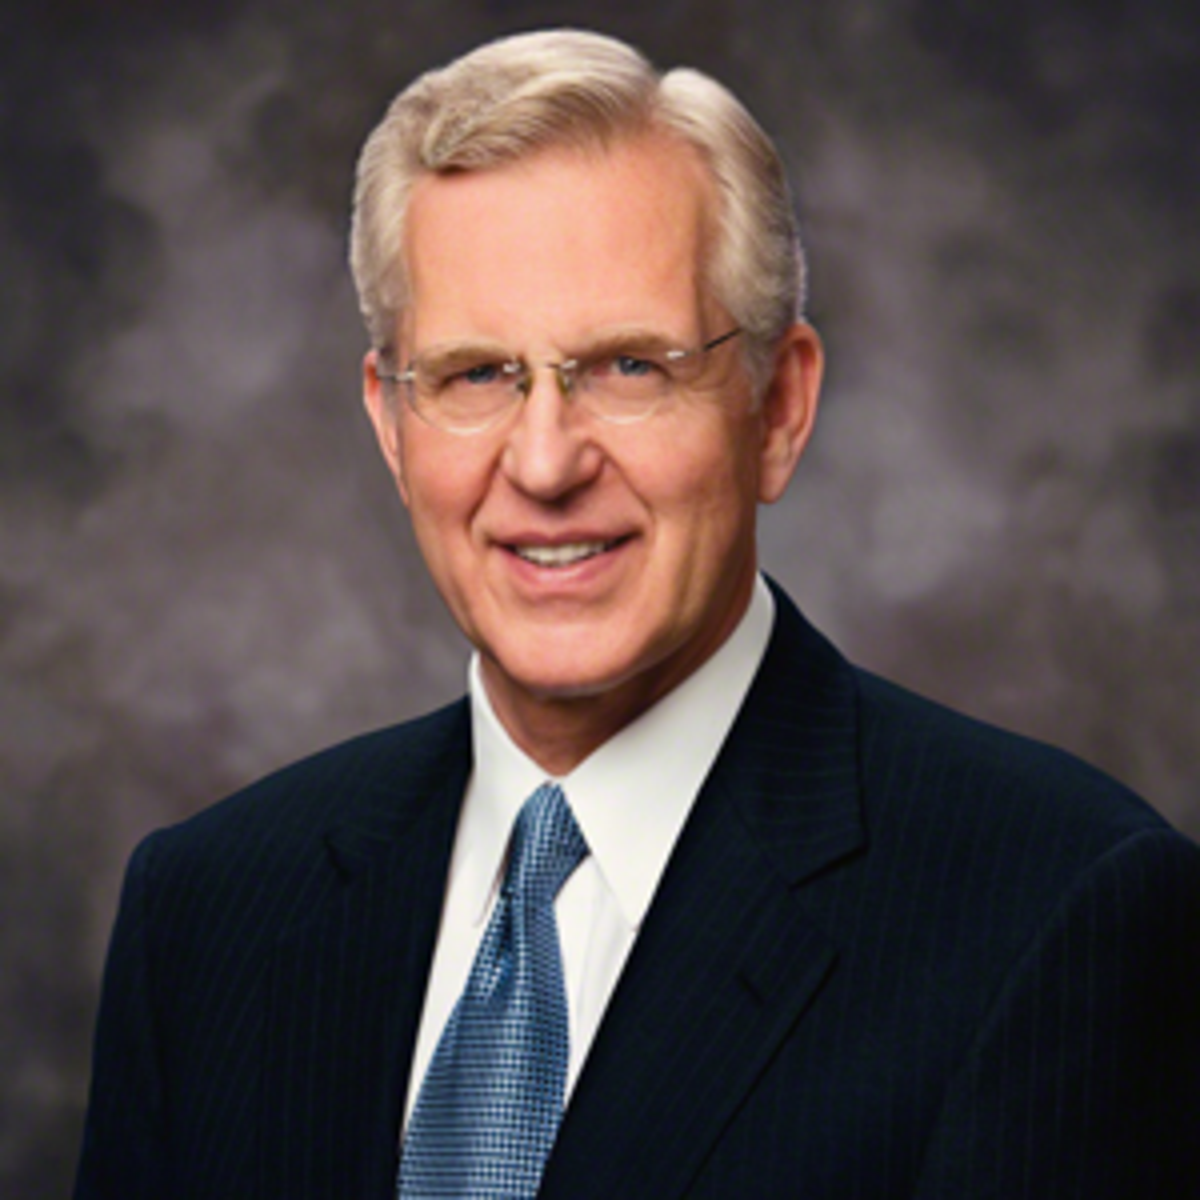 Elder D. Todd Christofferson of theQuorum of the Twelve